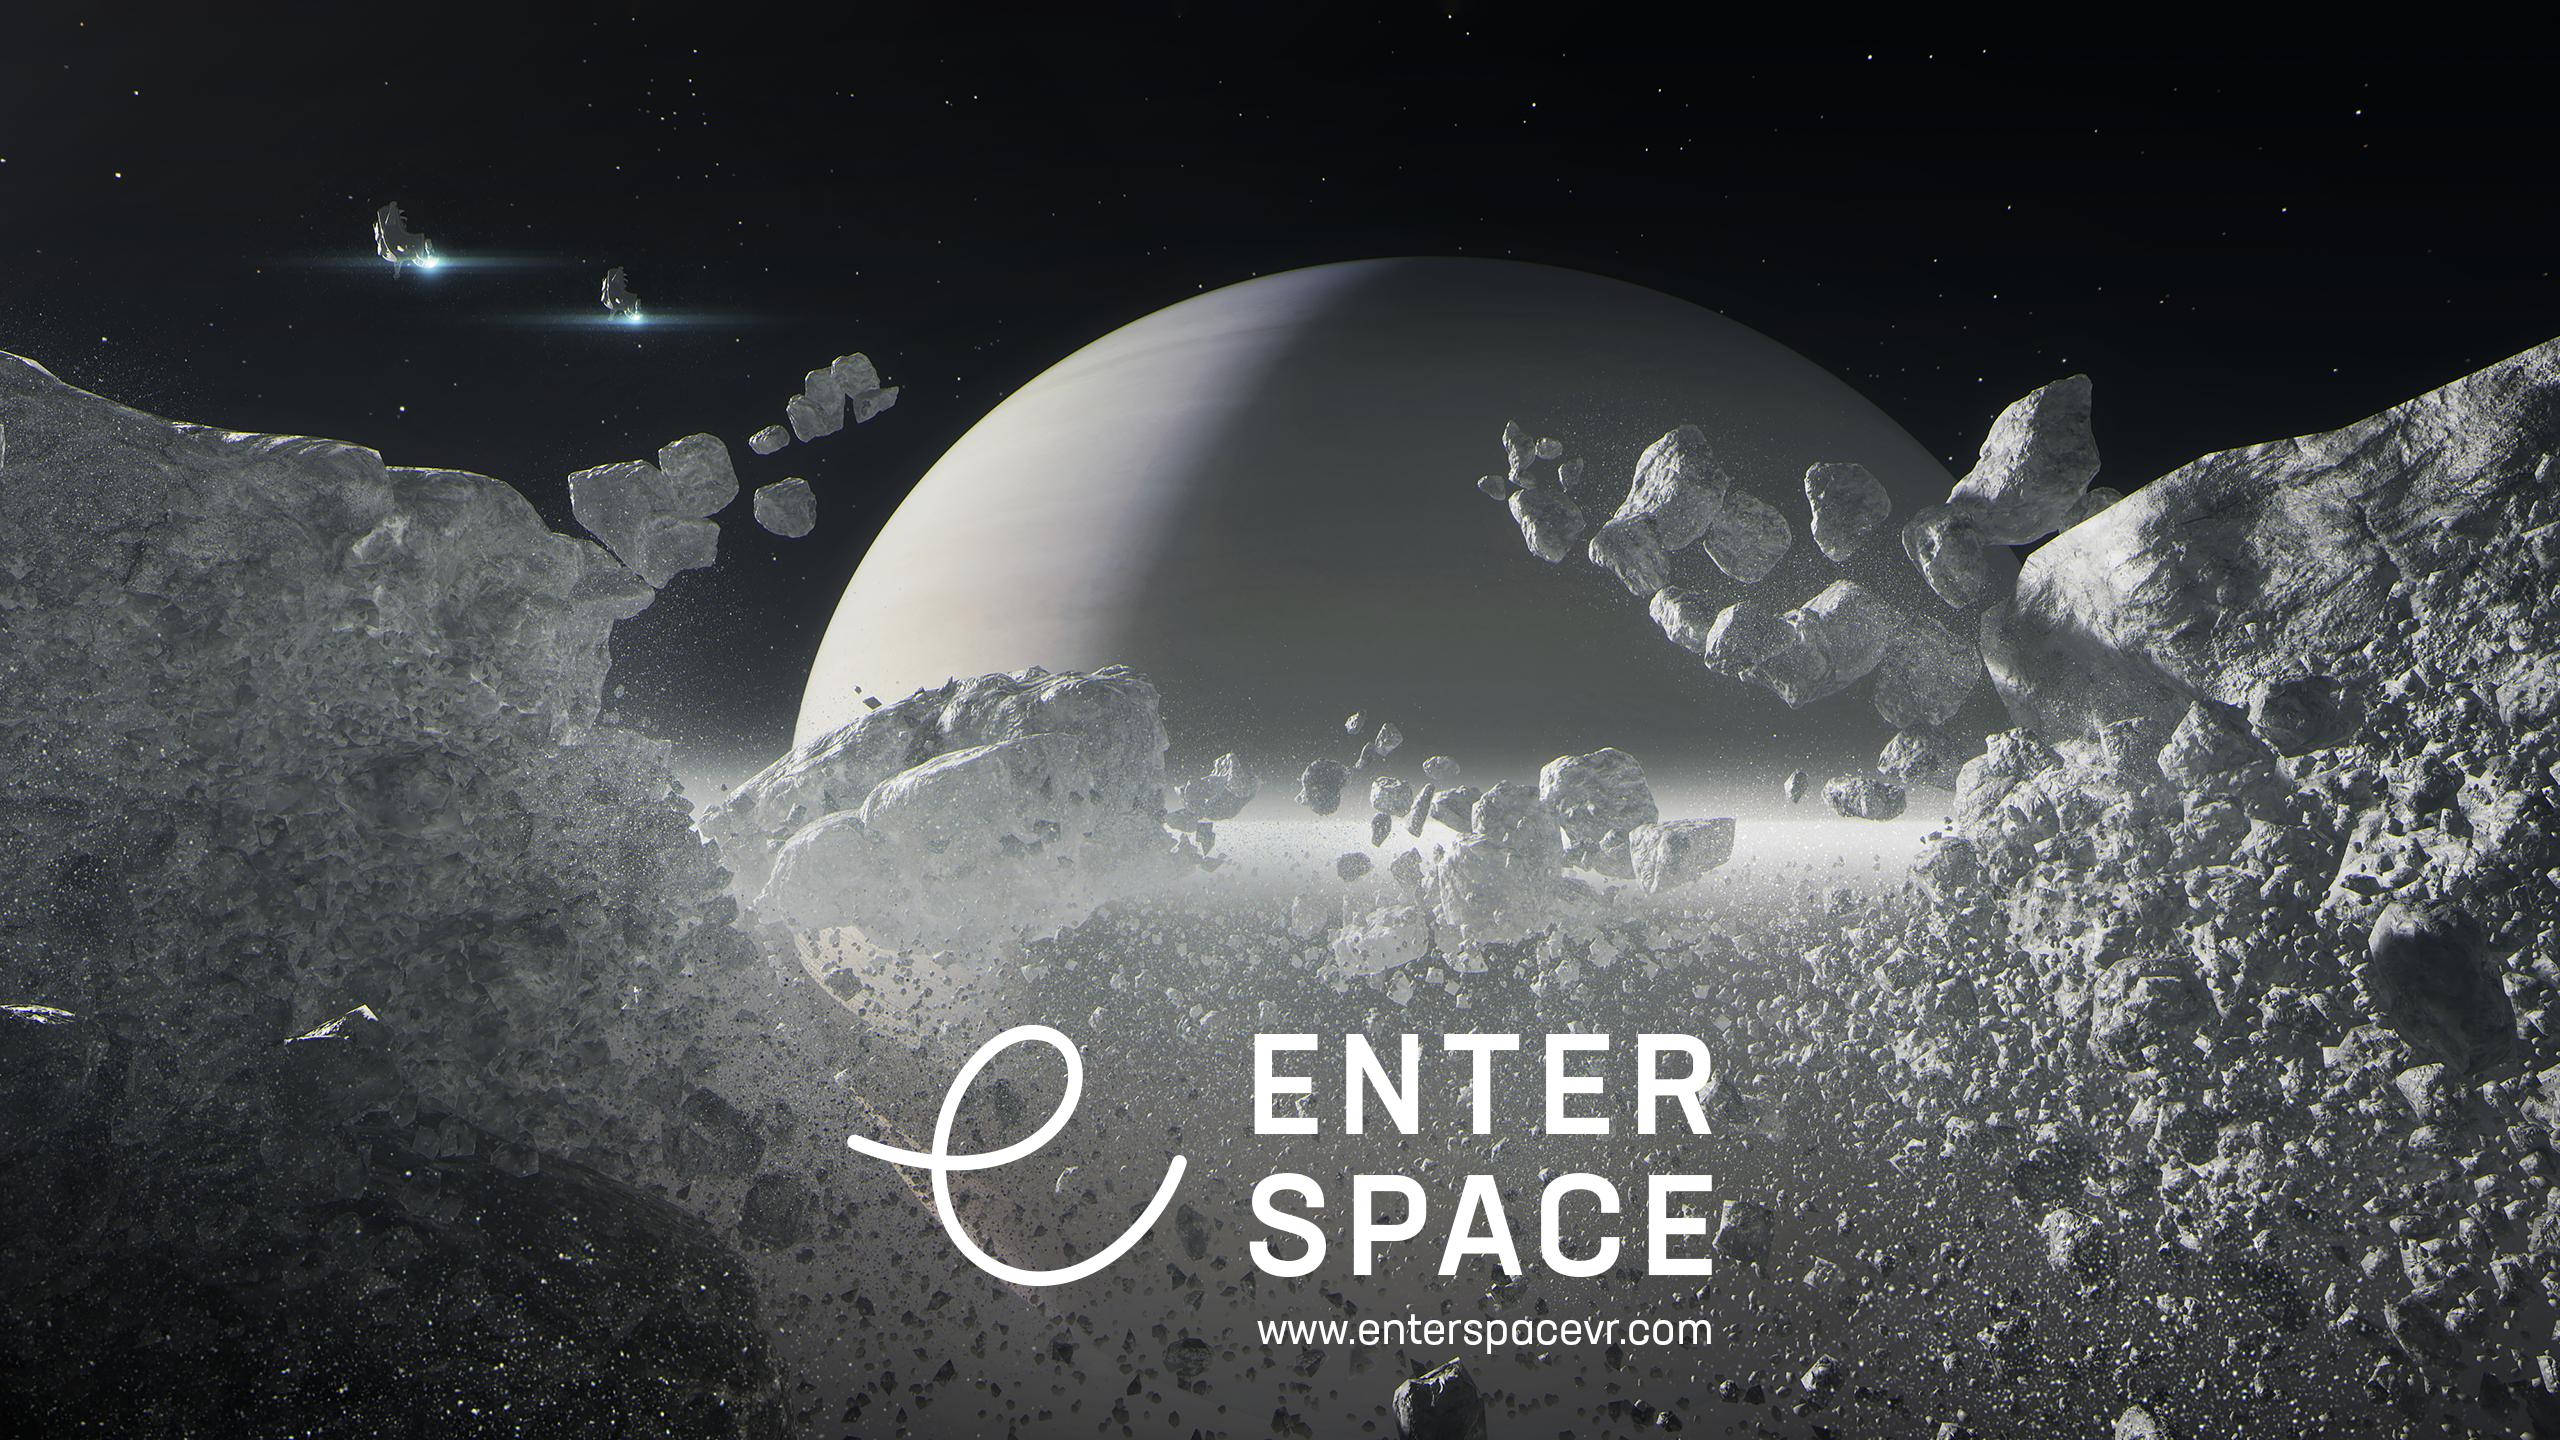 Enterspace